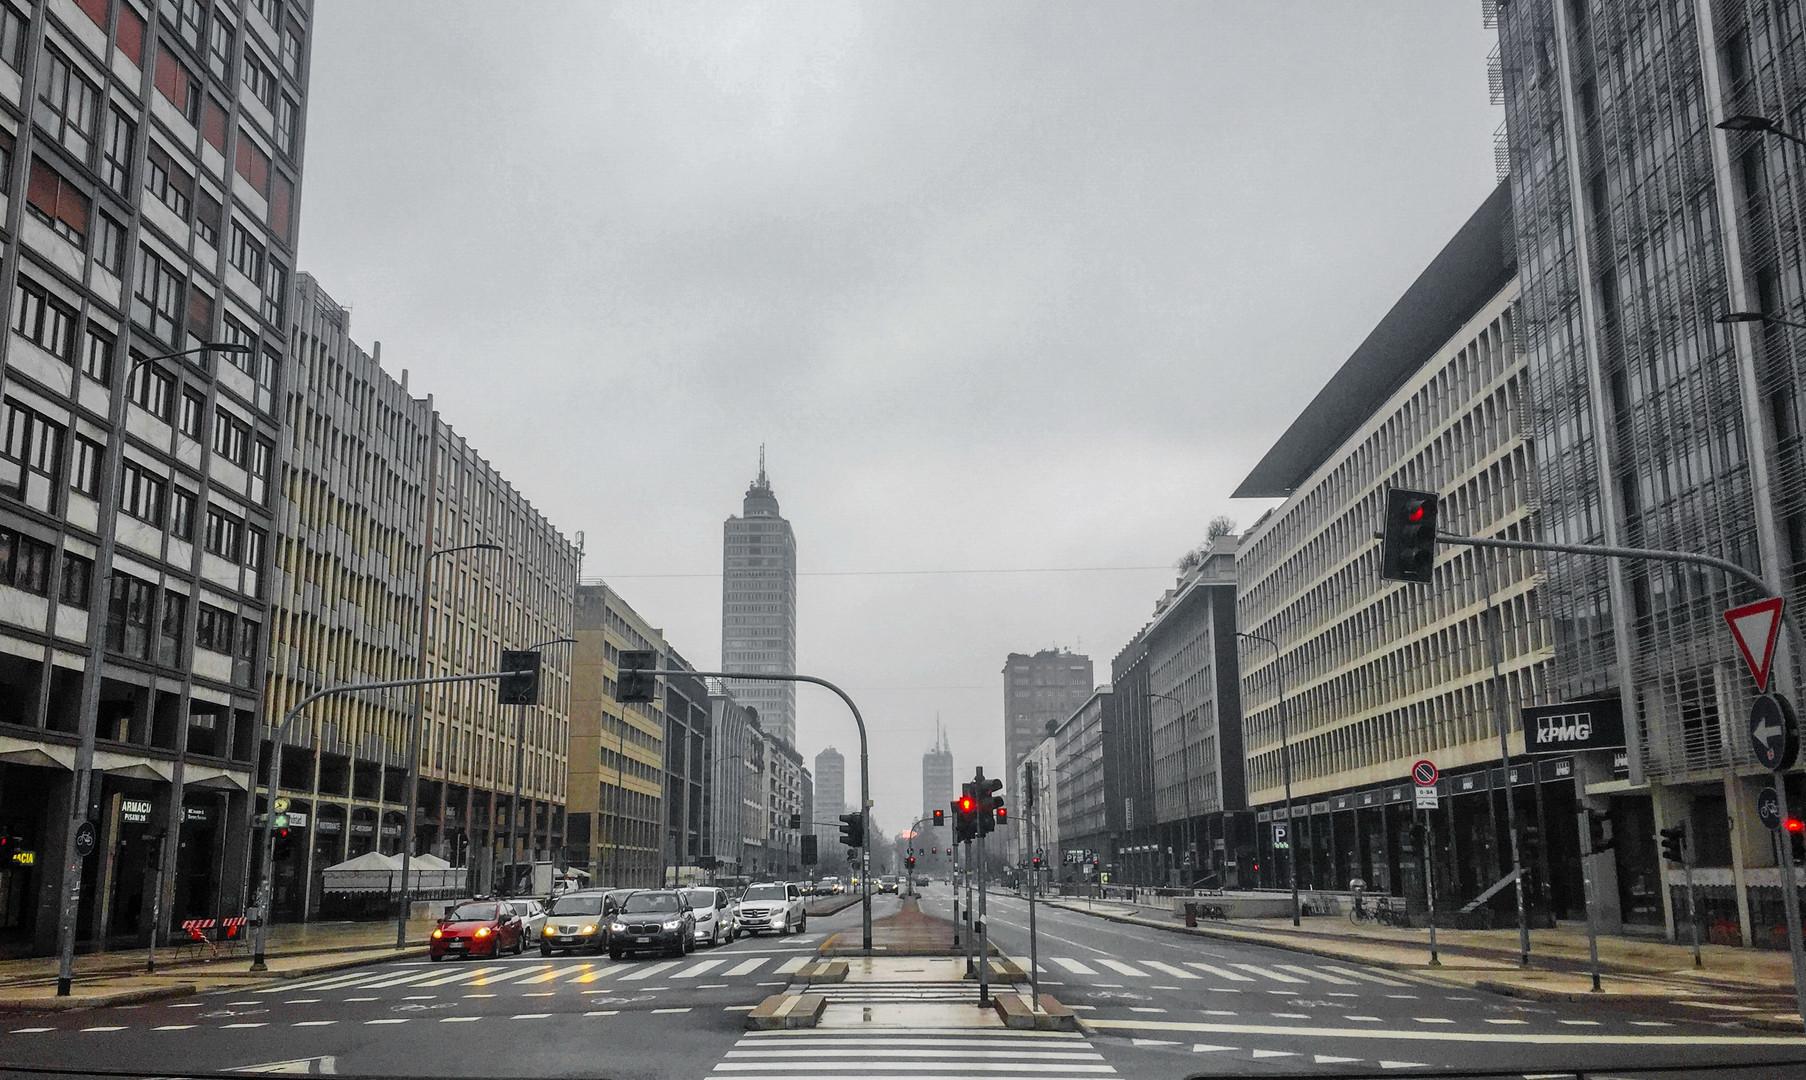 Проспект Витторио Пизани, Милан